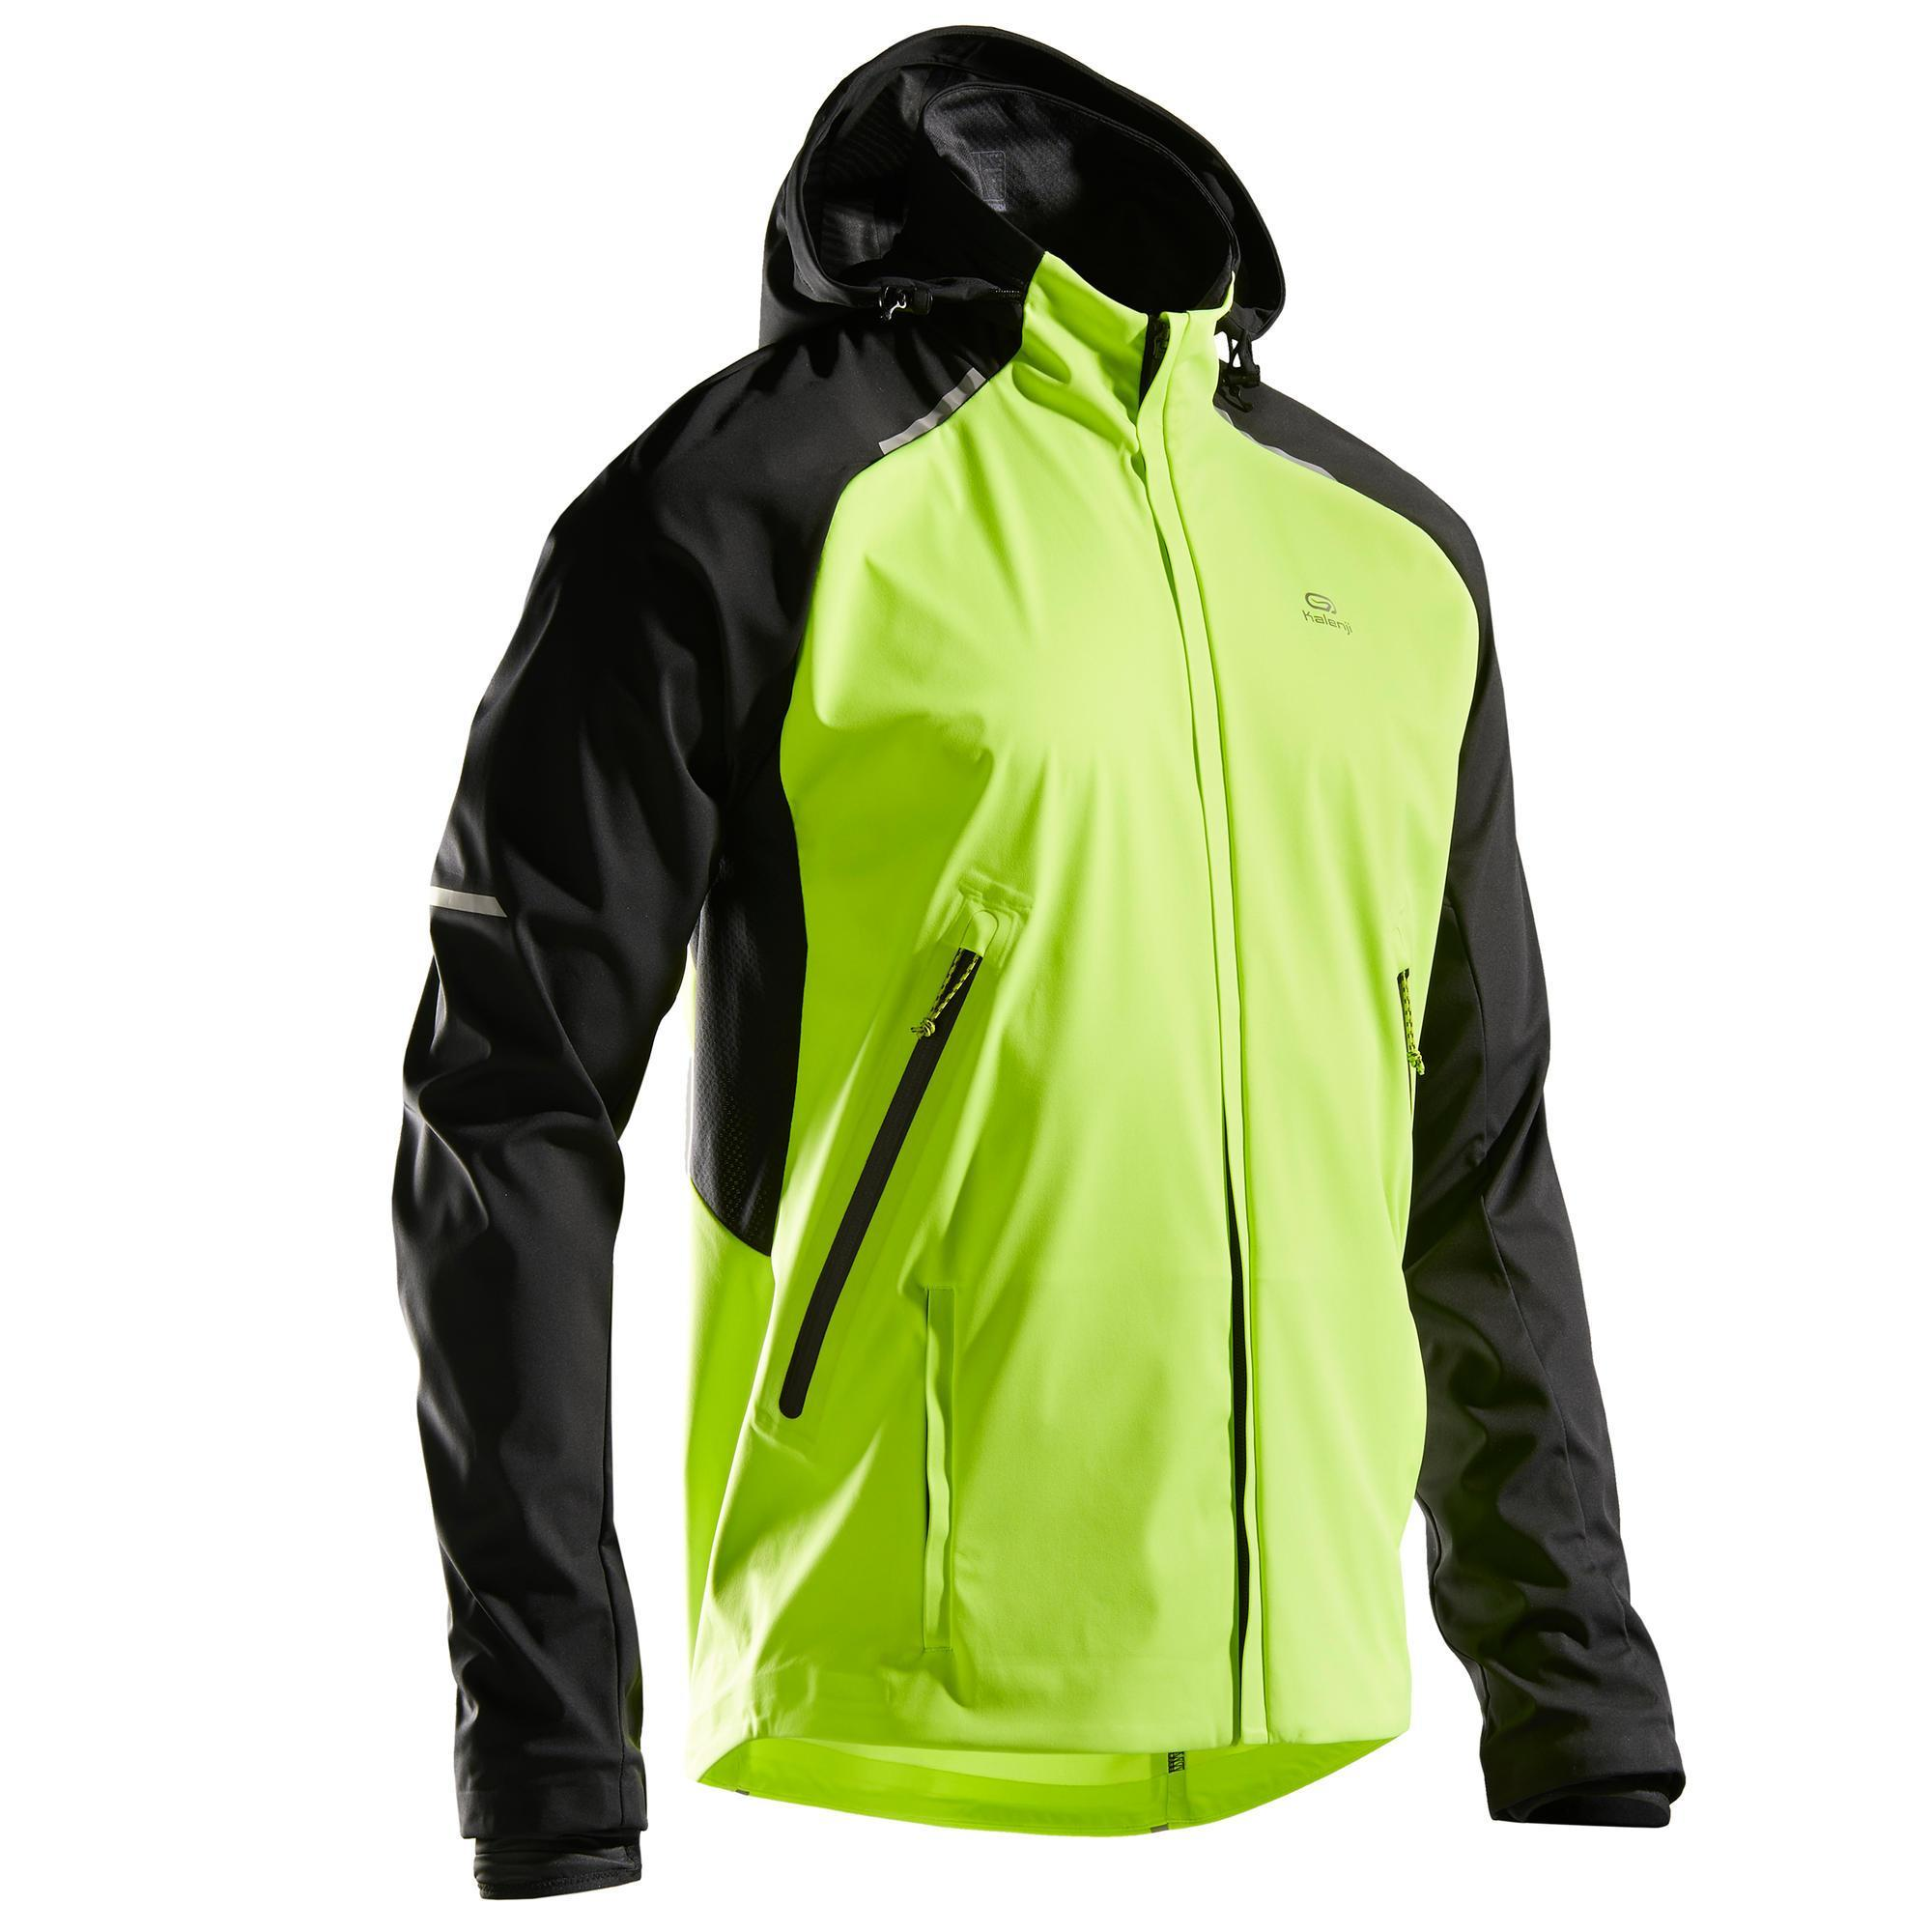 Laufjacke wasserabweisend winddicht Winter Kiprun Warm Regul Herren   Sportbekleidung > Sportjacken > Laufjacken   Kiprun